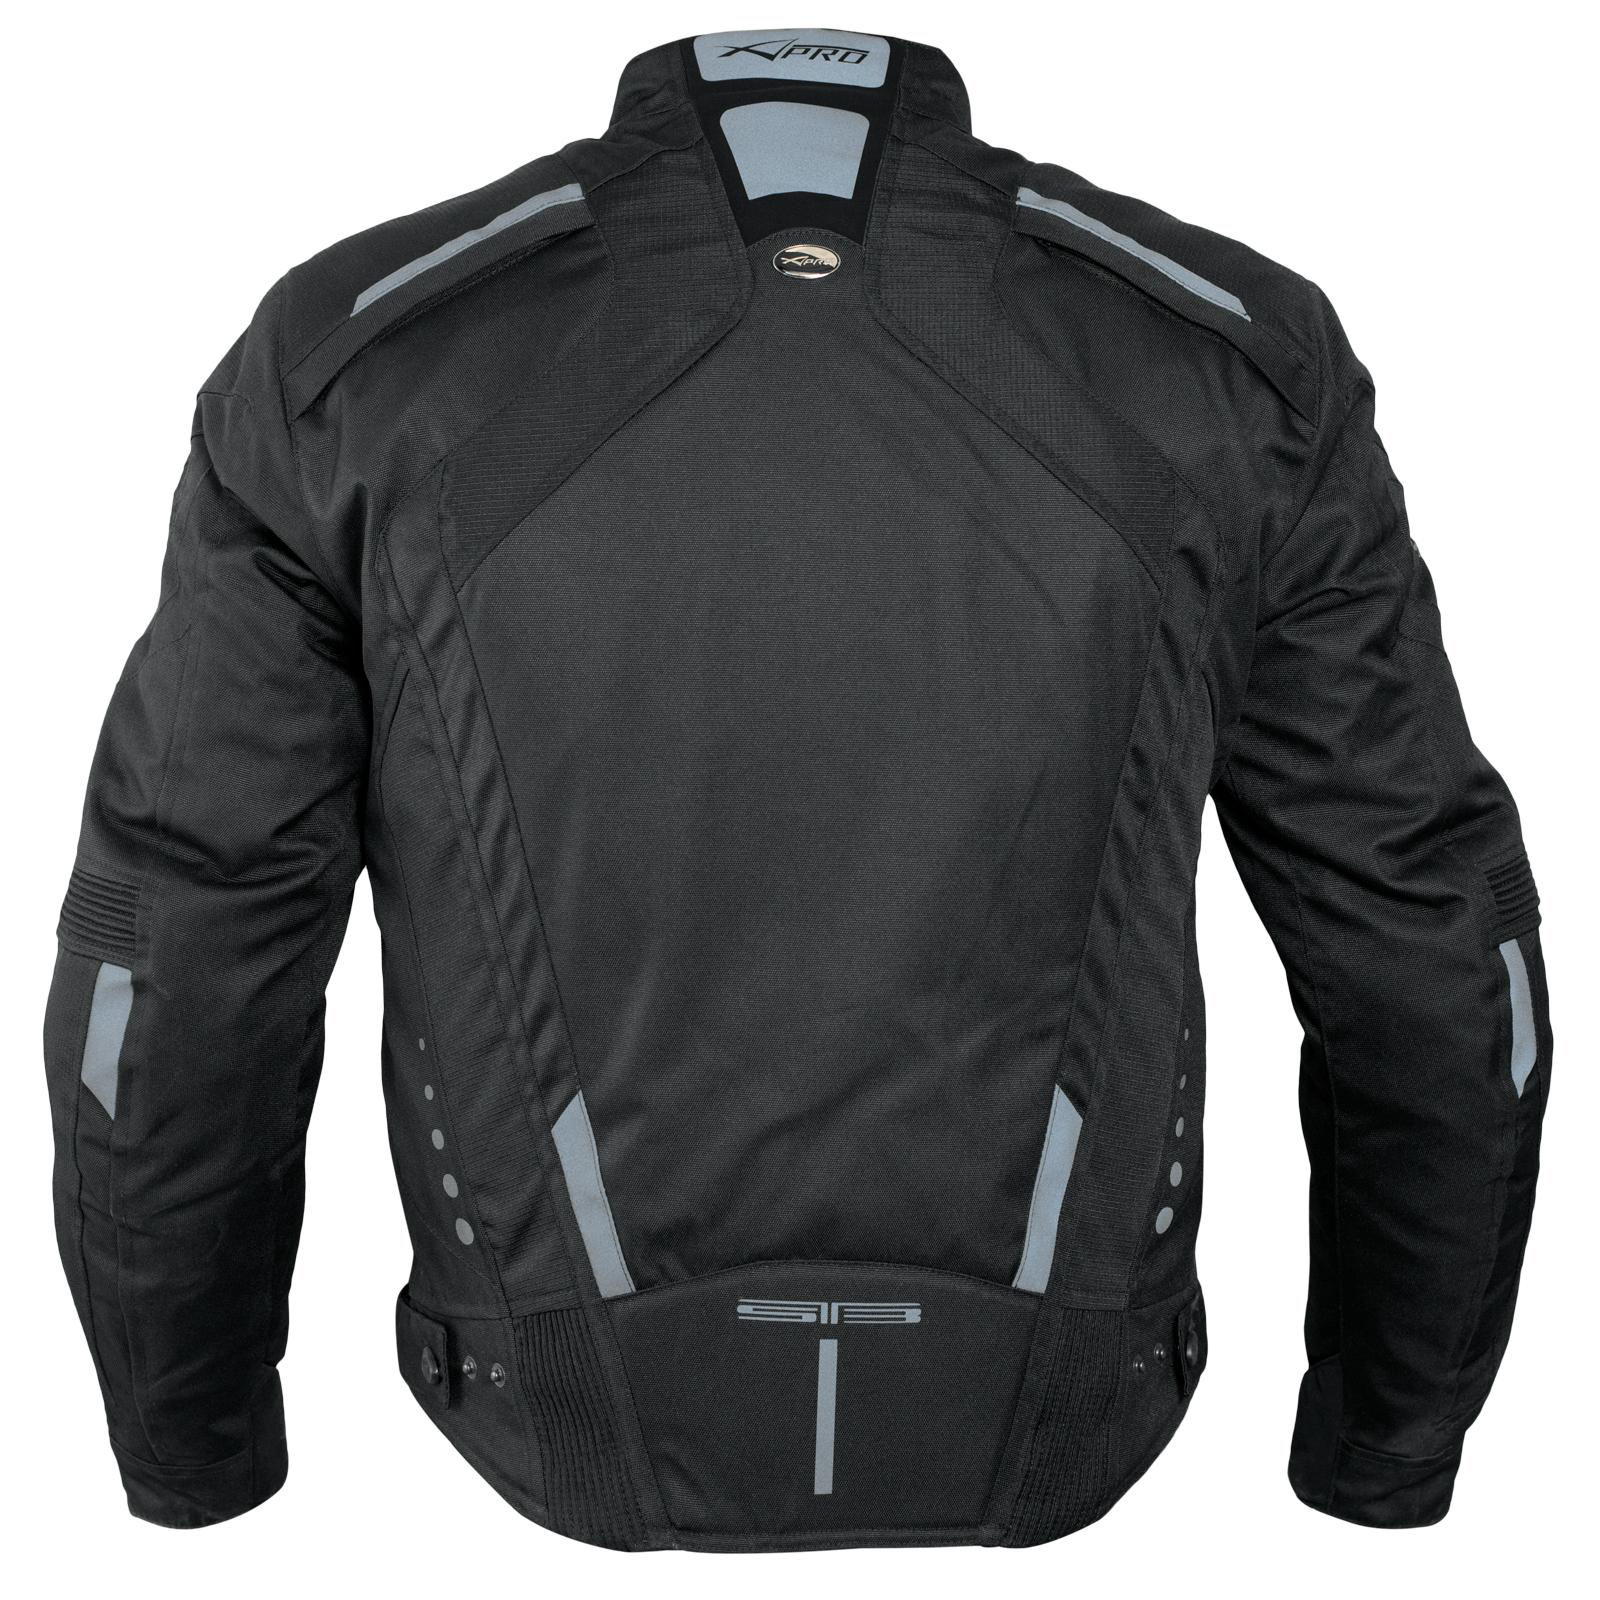 miniatuur 8 - Giacca-Cordura-Moto-Tessuto-Impermeabile-Sport-Termica-Sfoderabile-Nero